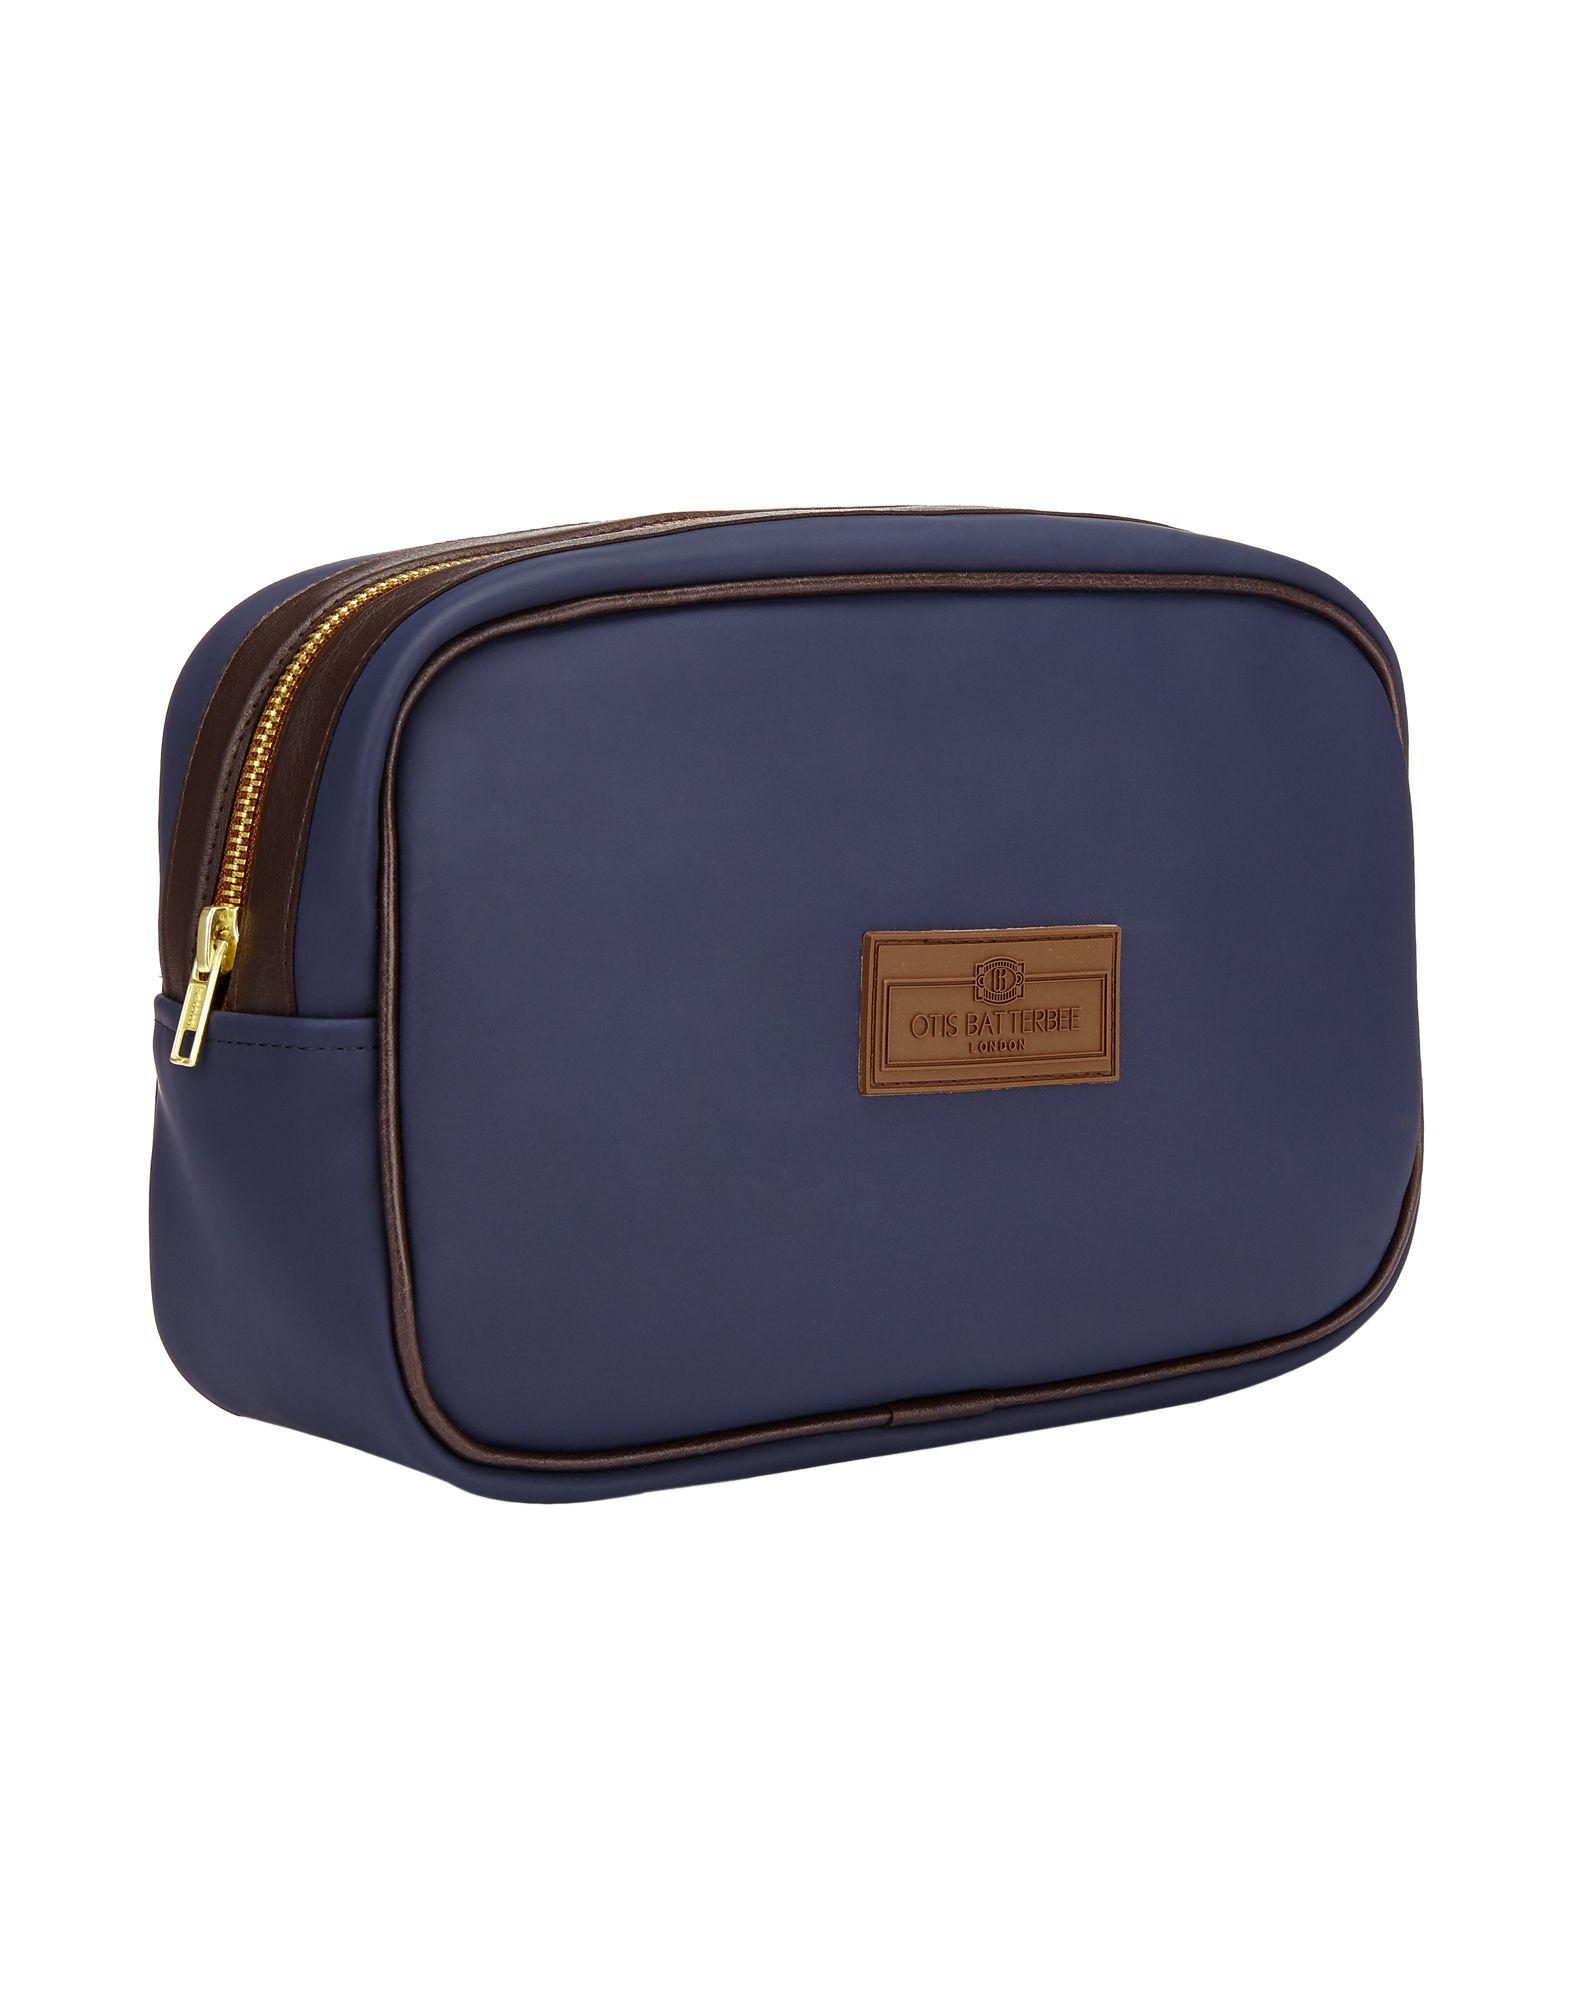 OTIS BATTERBEE Beauty case